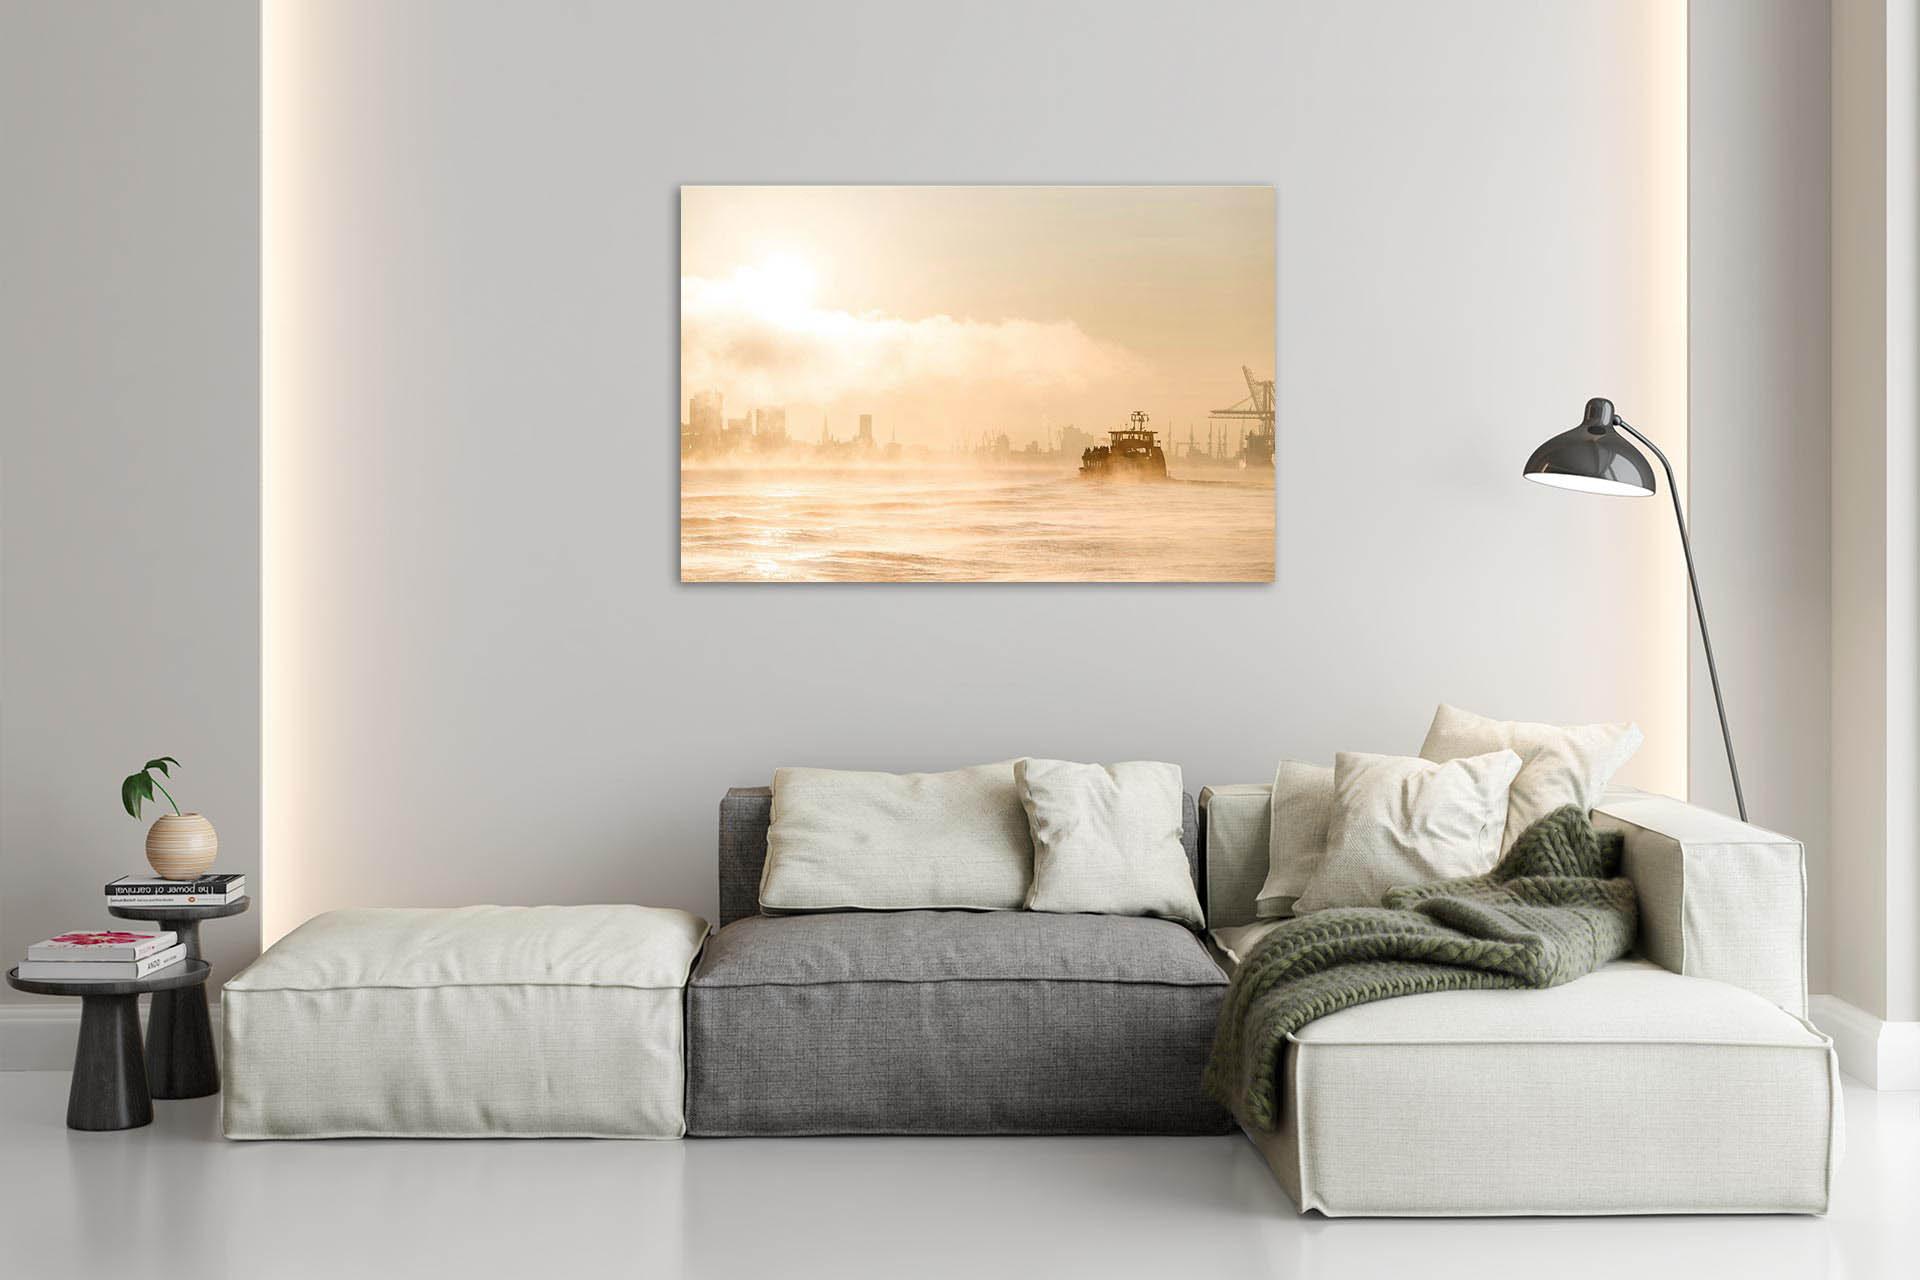 LCW209-nebel-elbe-hamburg-wandbild-bild-auf-leinwand-acrylglas-aludibond-wohnzimmer